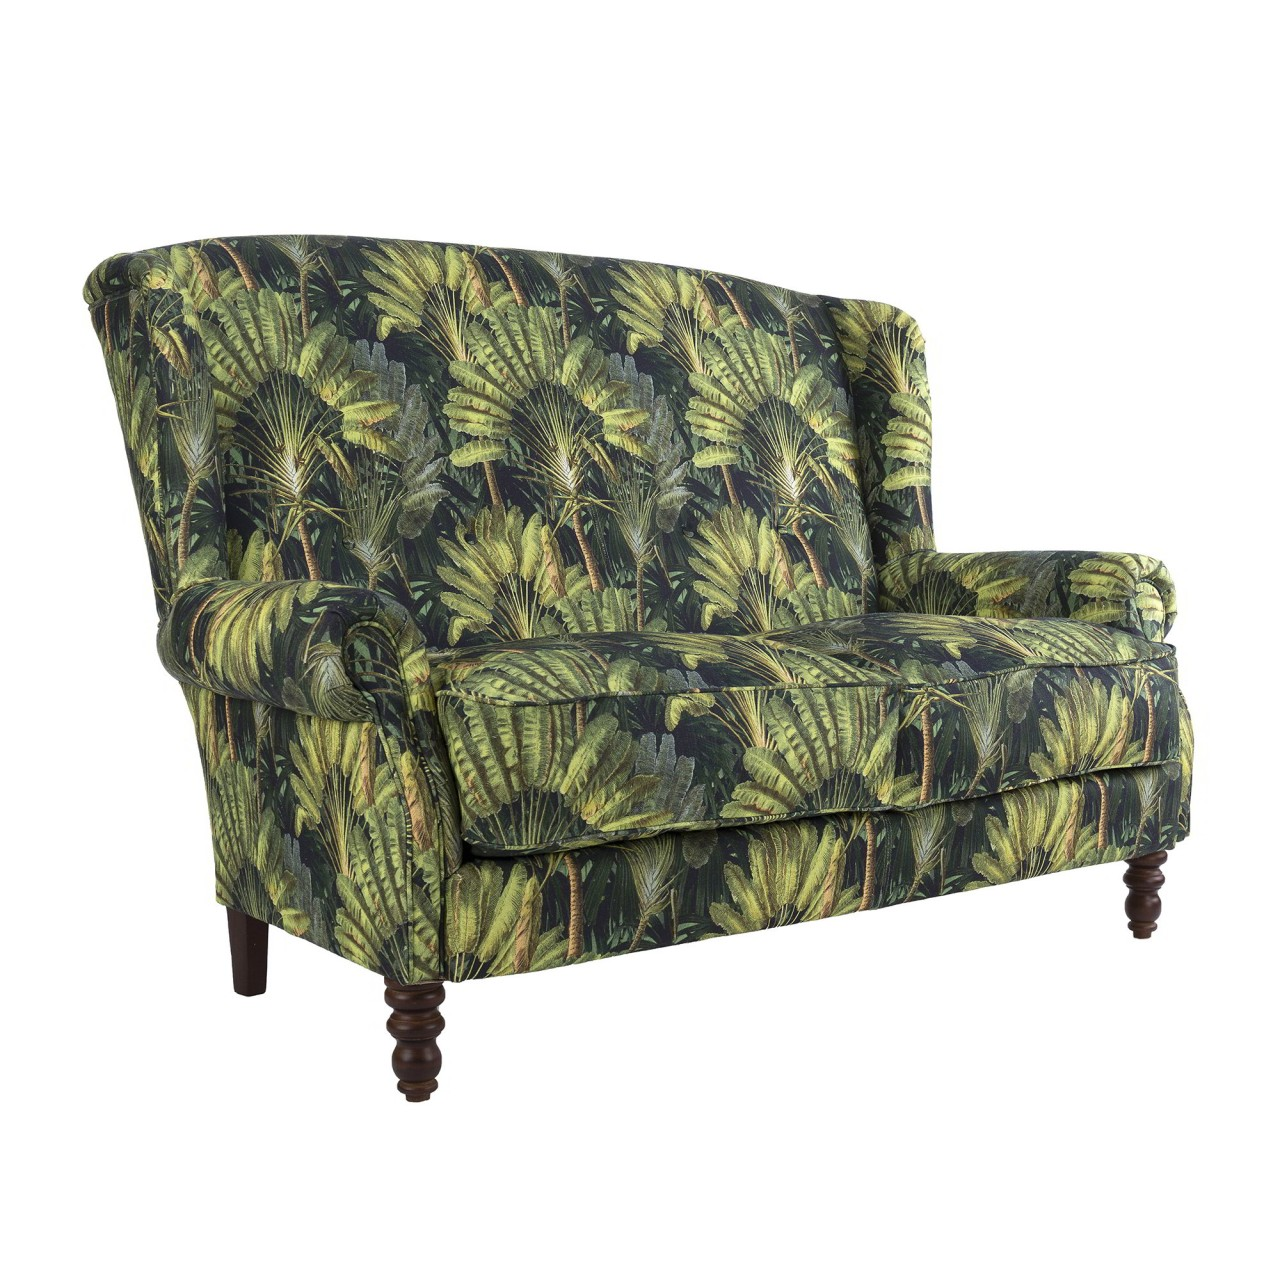 ABIGAIL Sofa - TRAVELLER'S PALM Linen